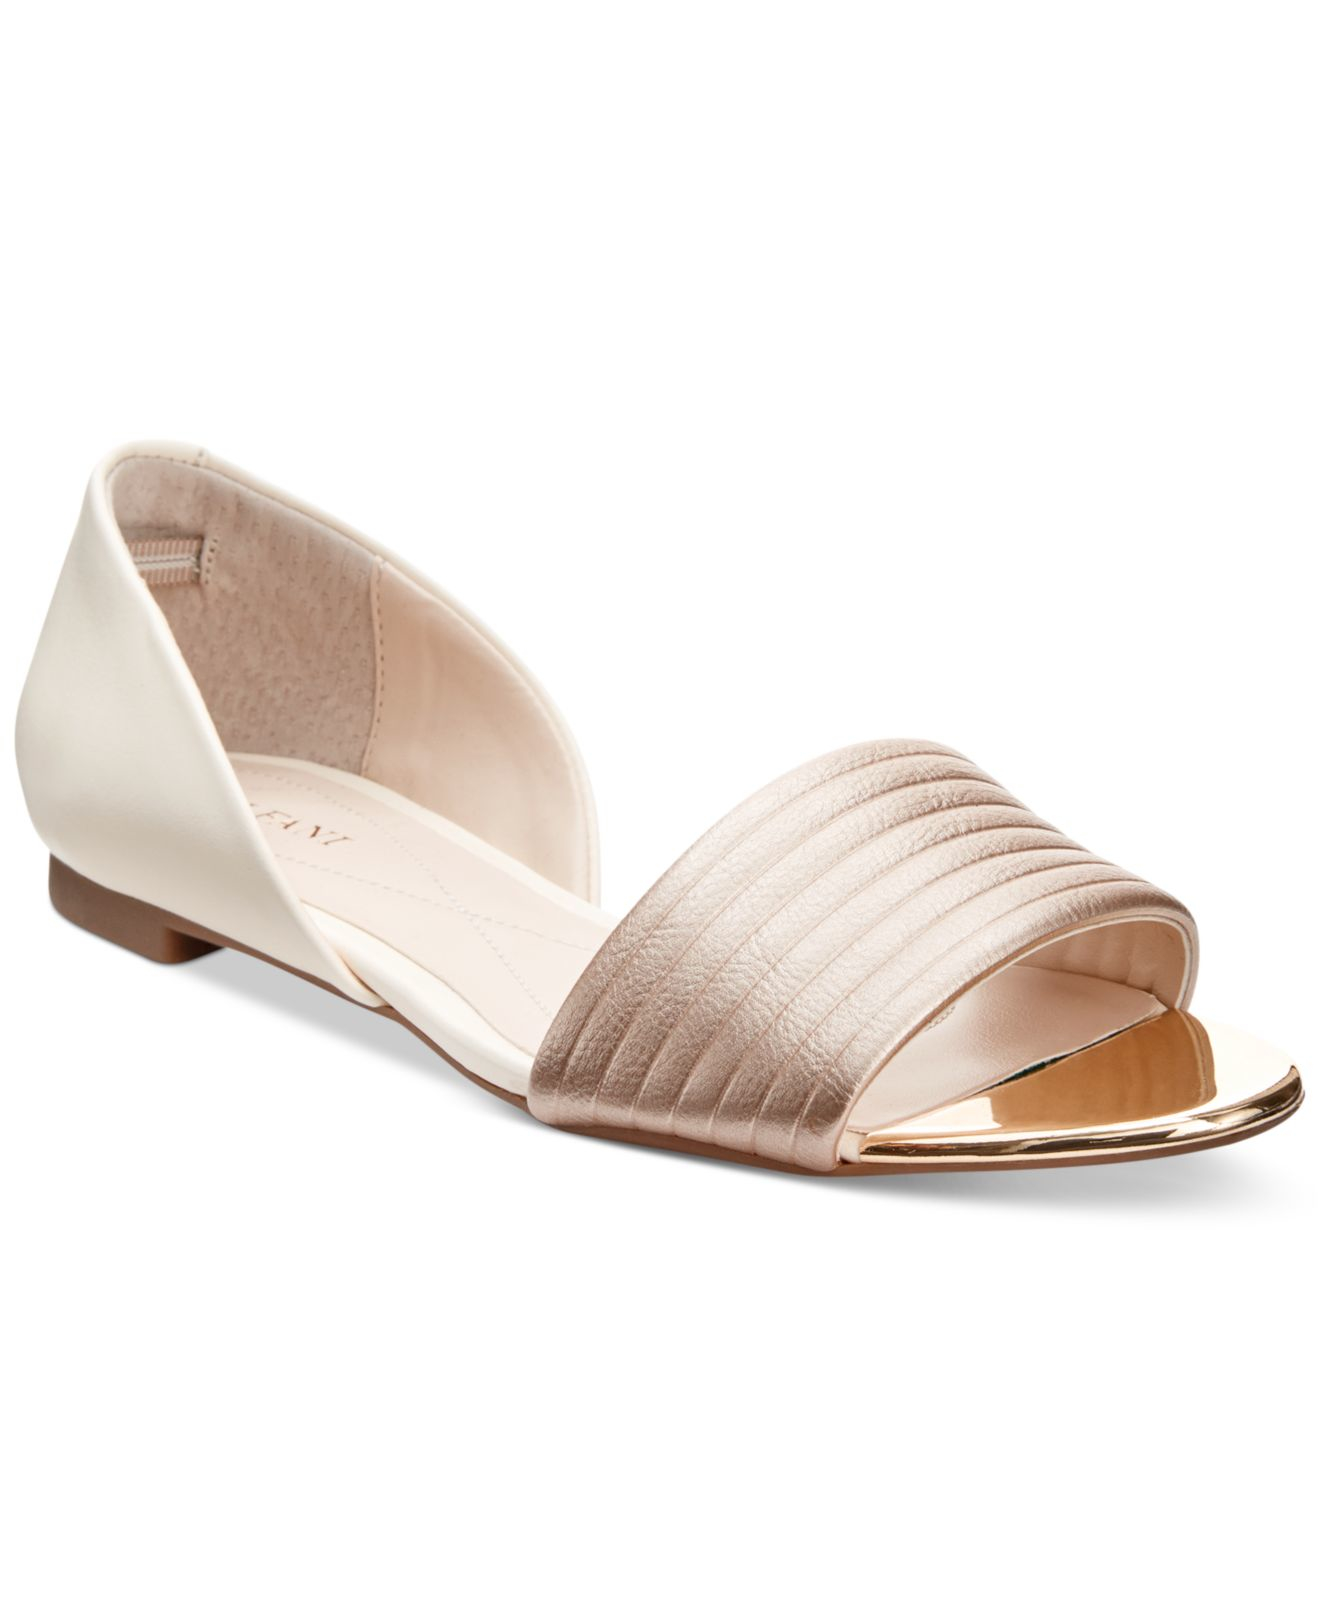 Alfani Shoes Uk